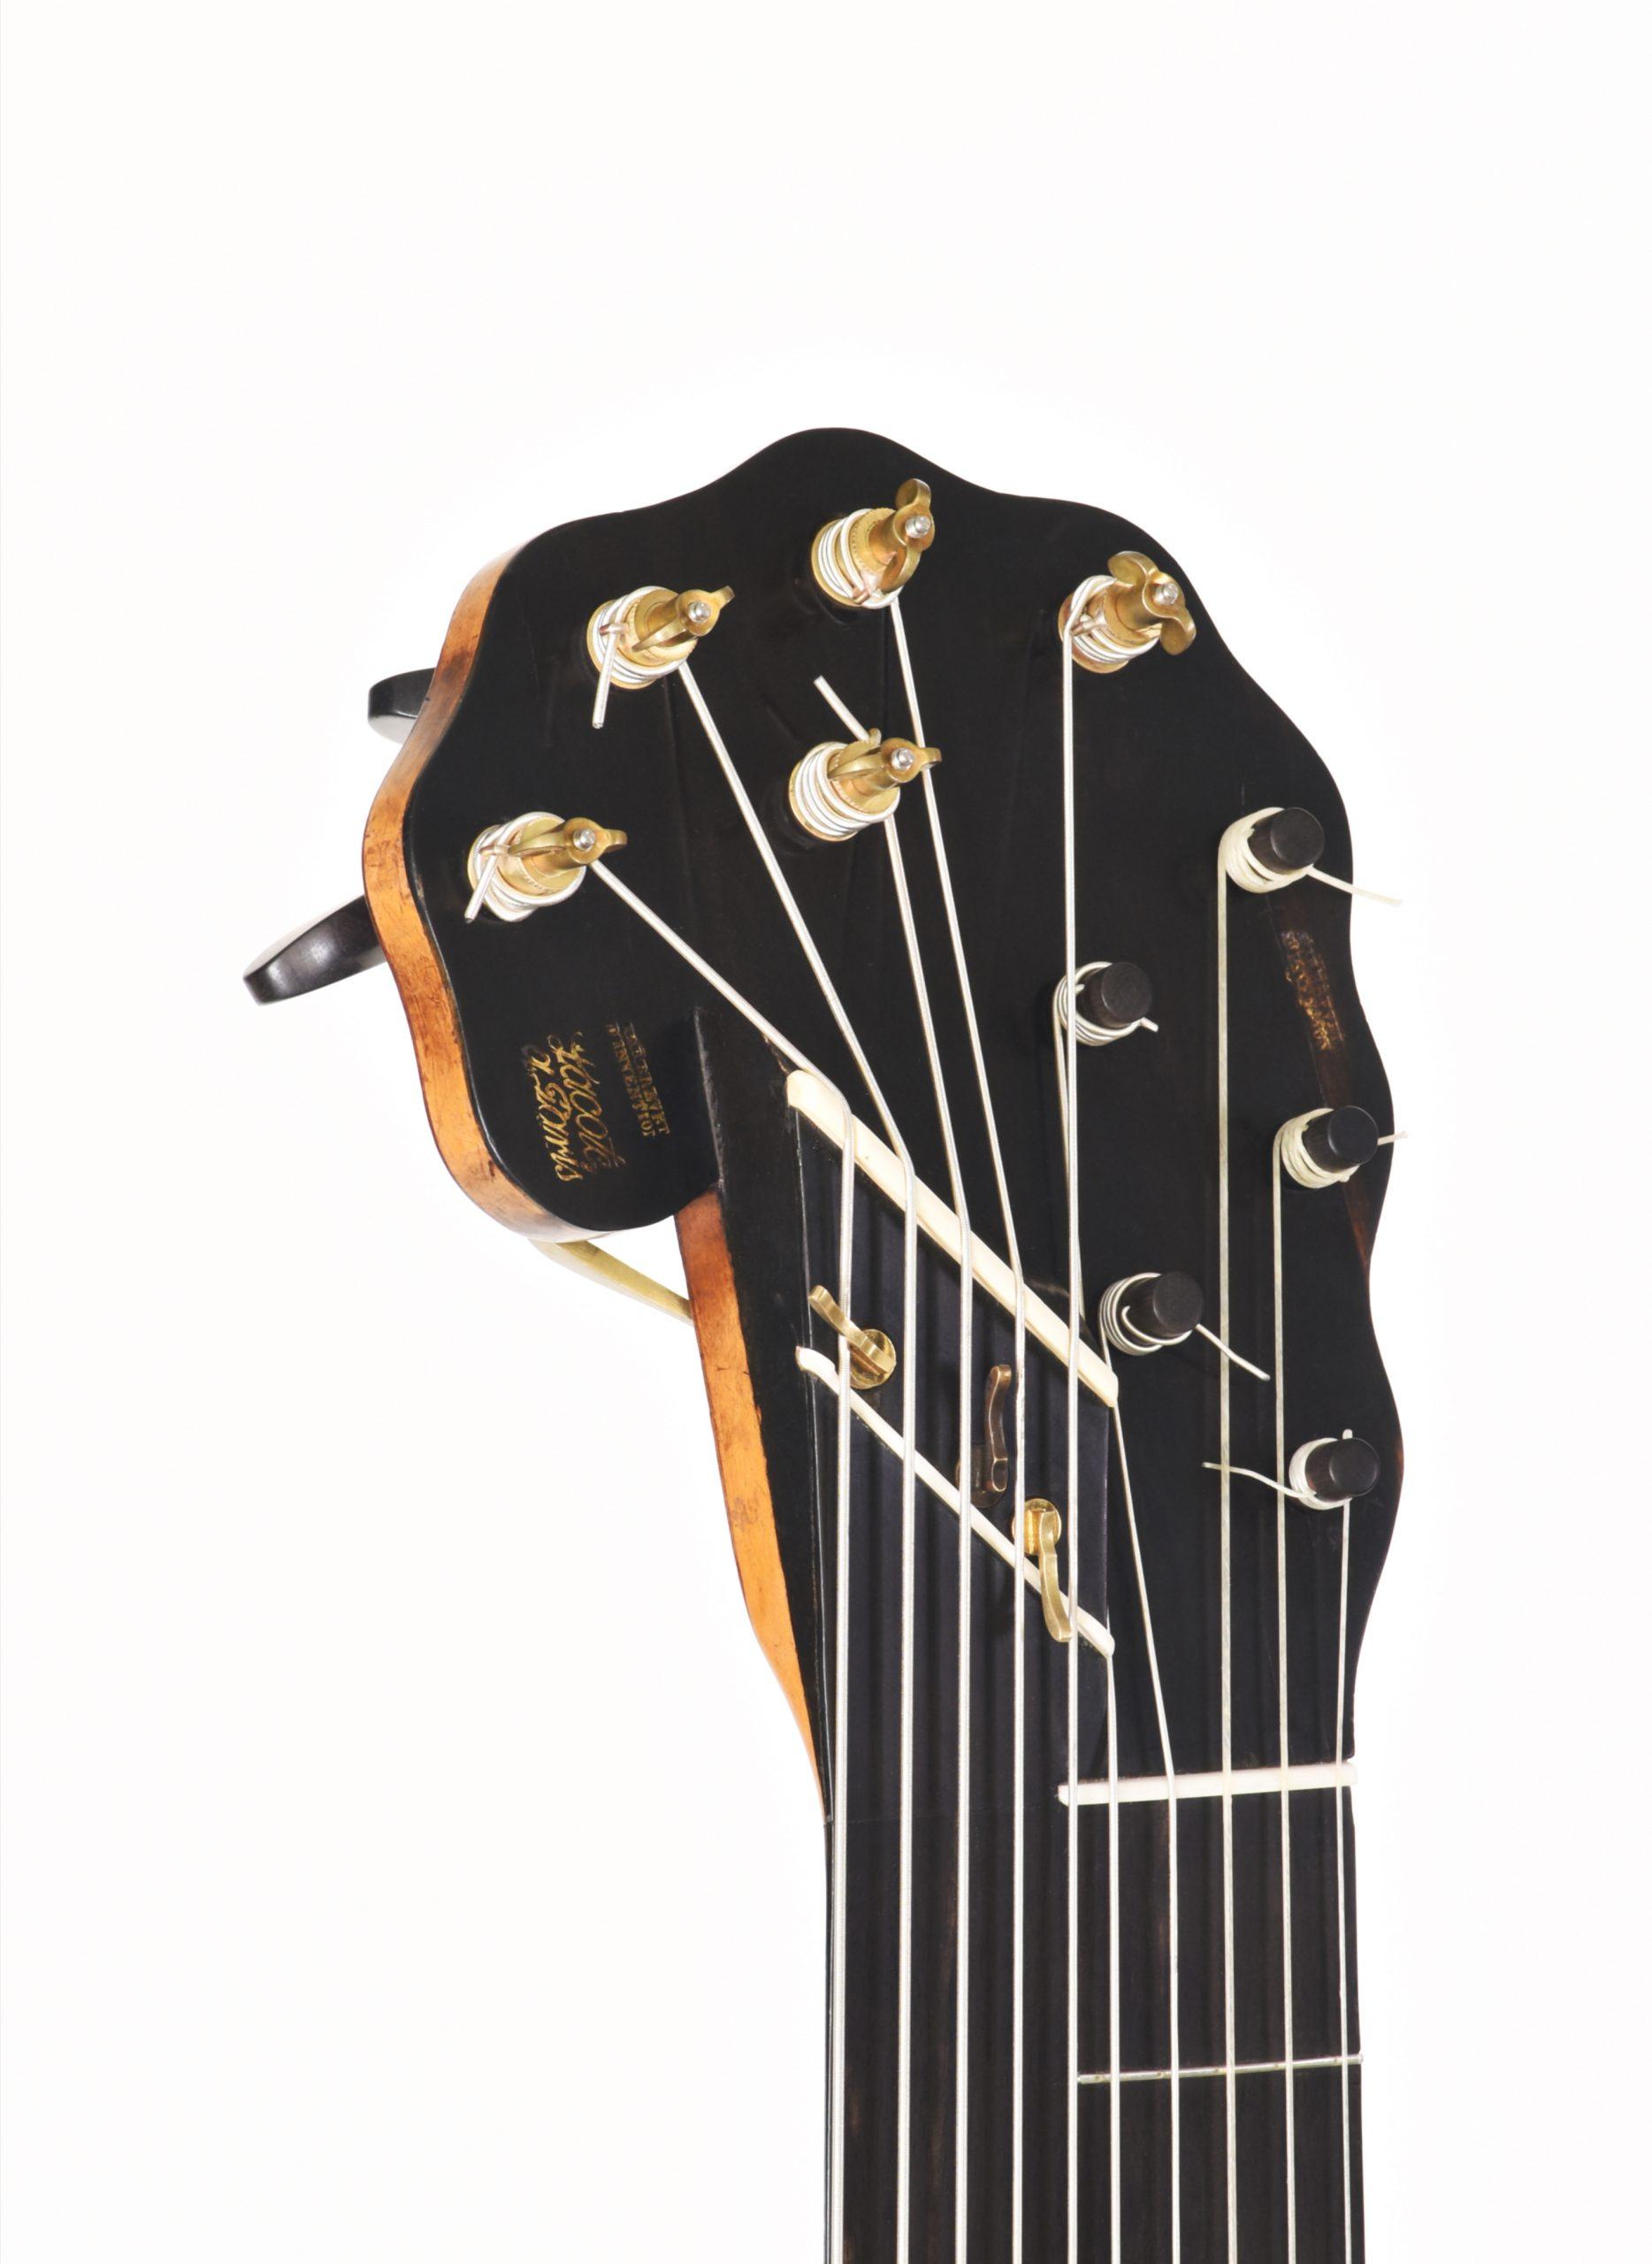 Detail of guitar decacorde